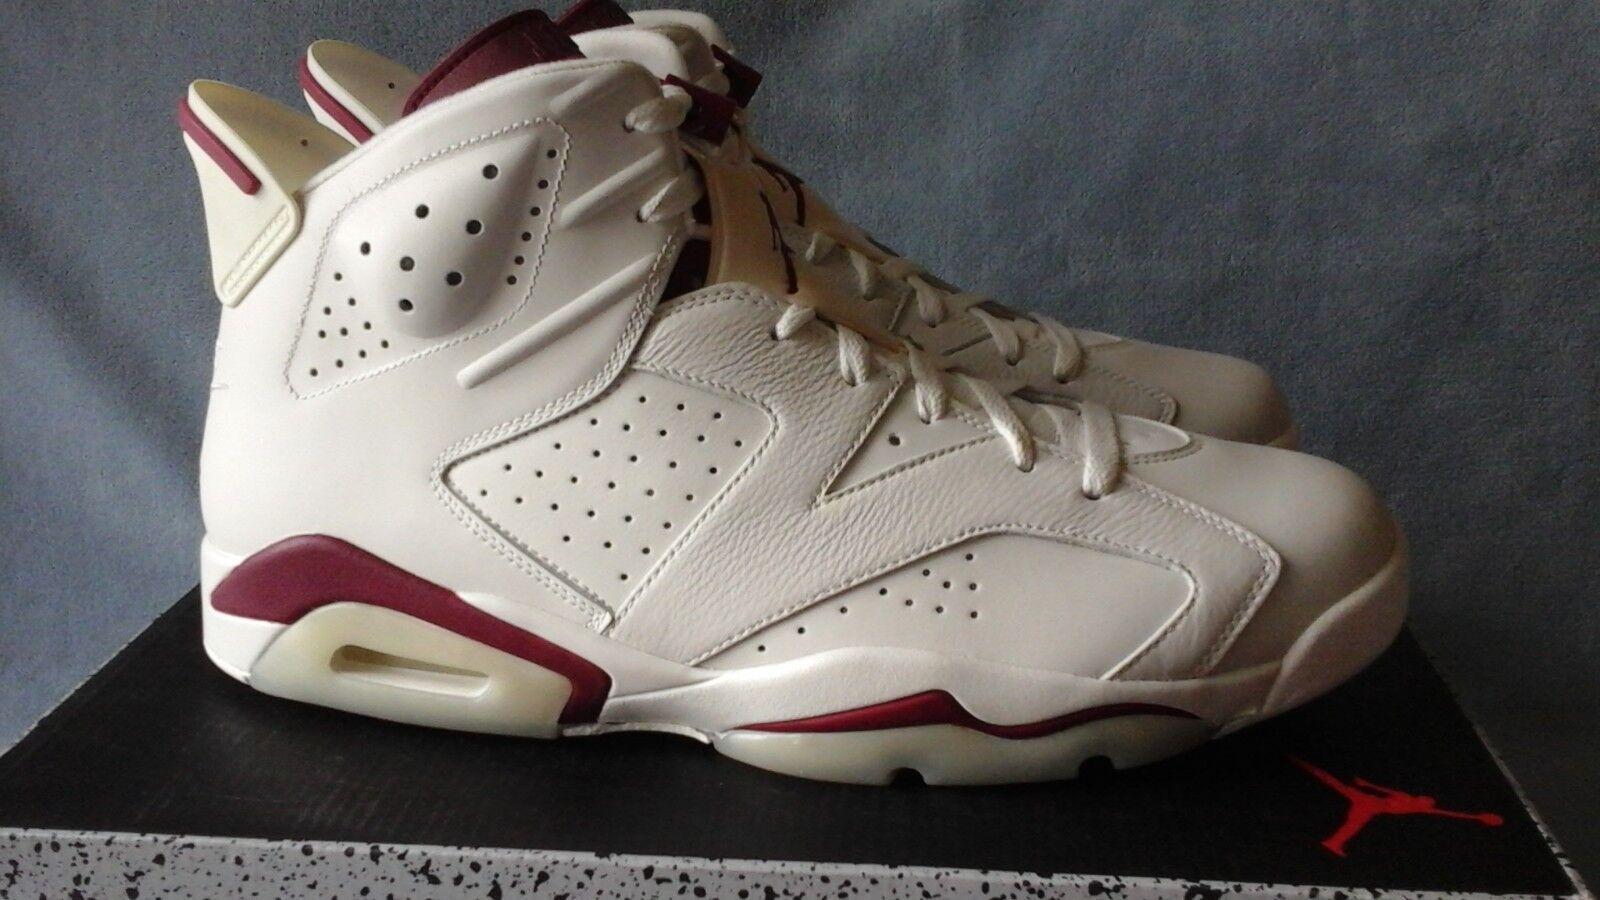 Nike Air Jordan 6 Retro OG Maroon 384664-116 Size 14